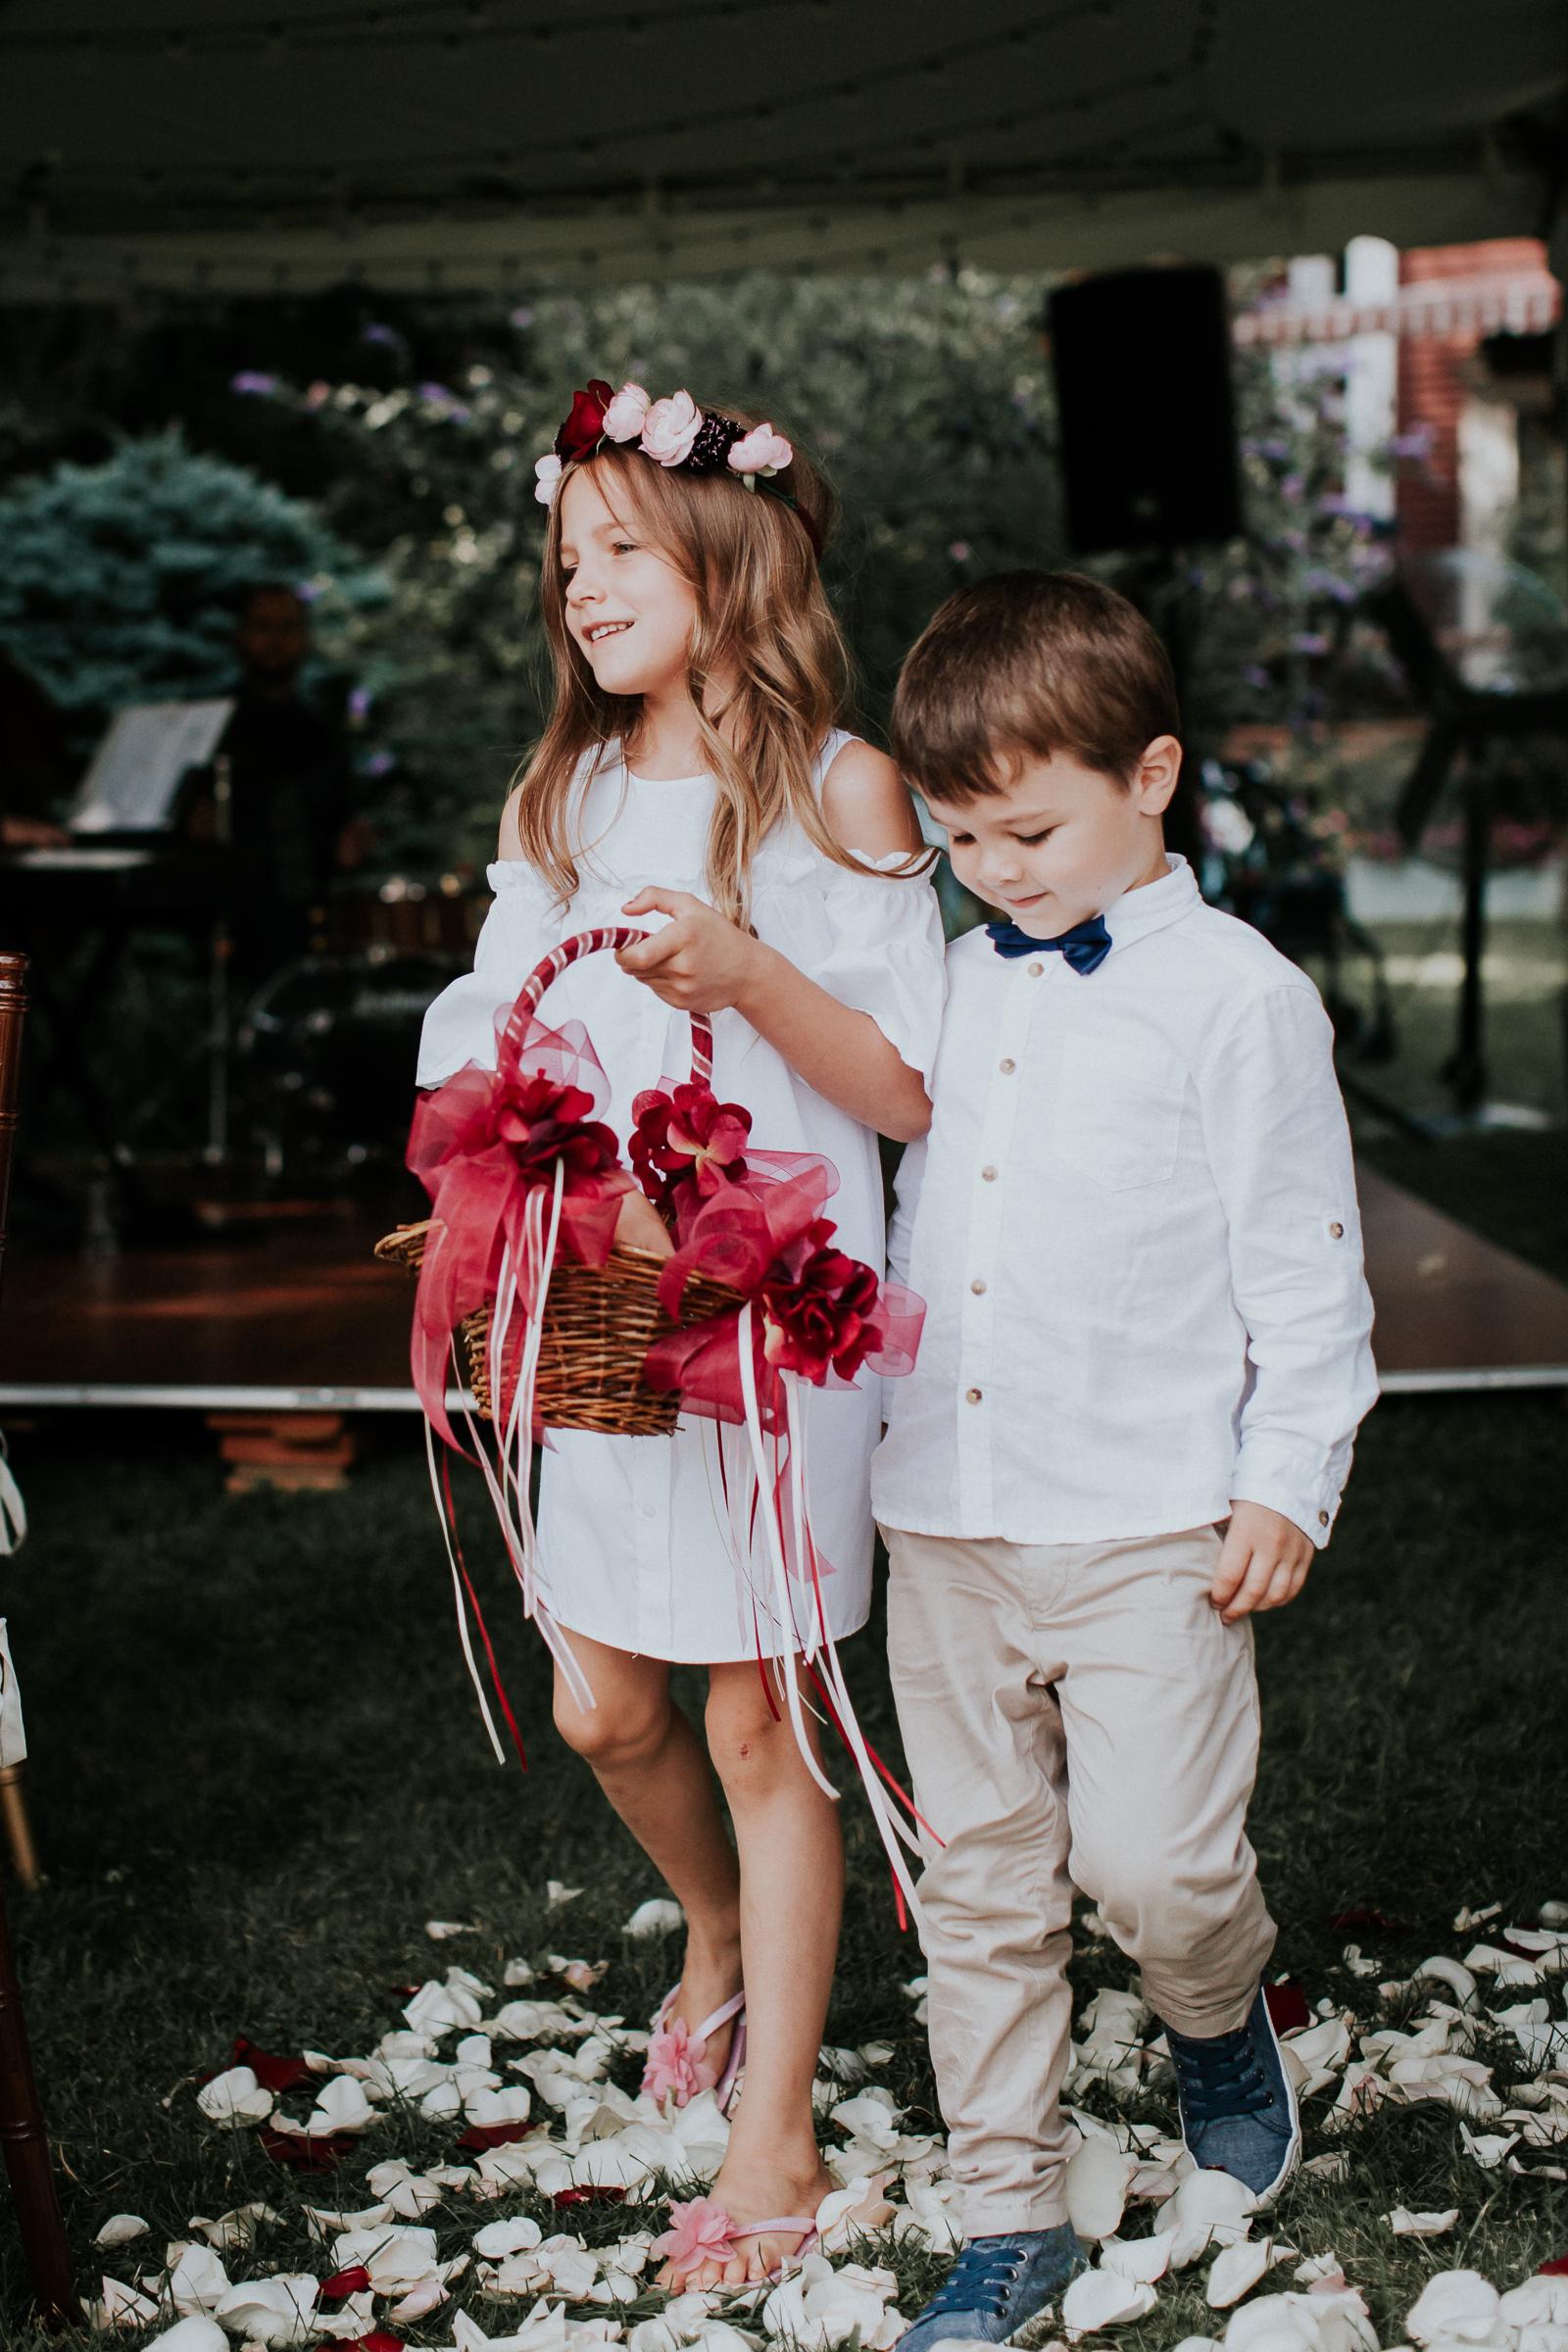 Backyard-Intimate-Adventurous-Destination-Wedding-Darien-Connecticut-Documentary-Wedding-Photography-52.jpg